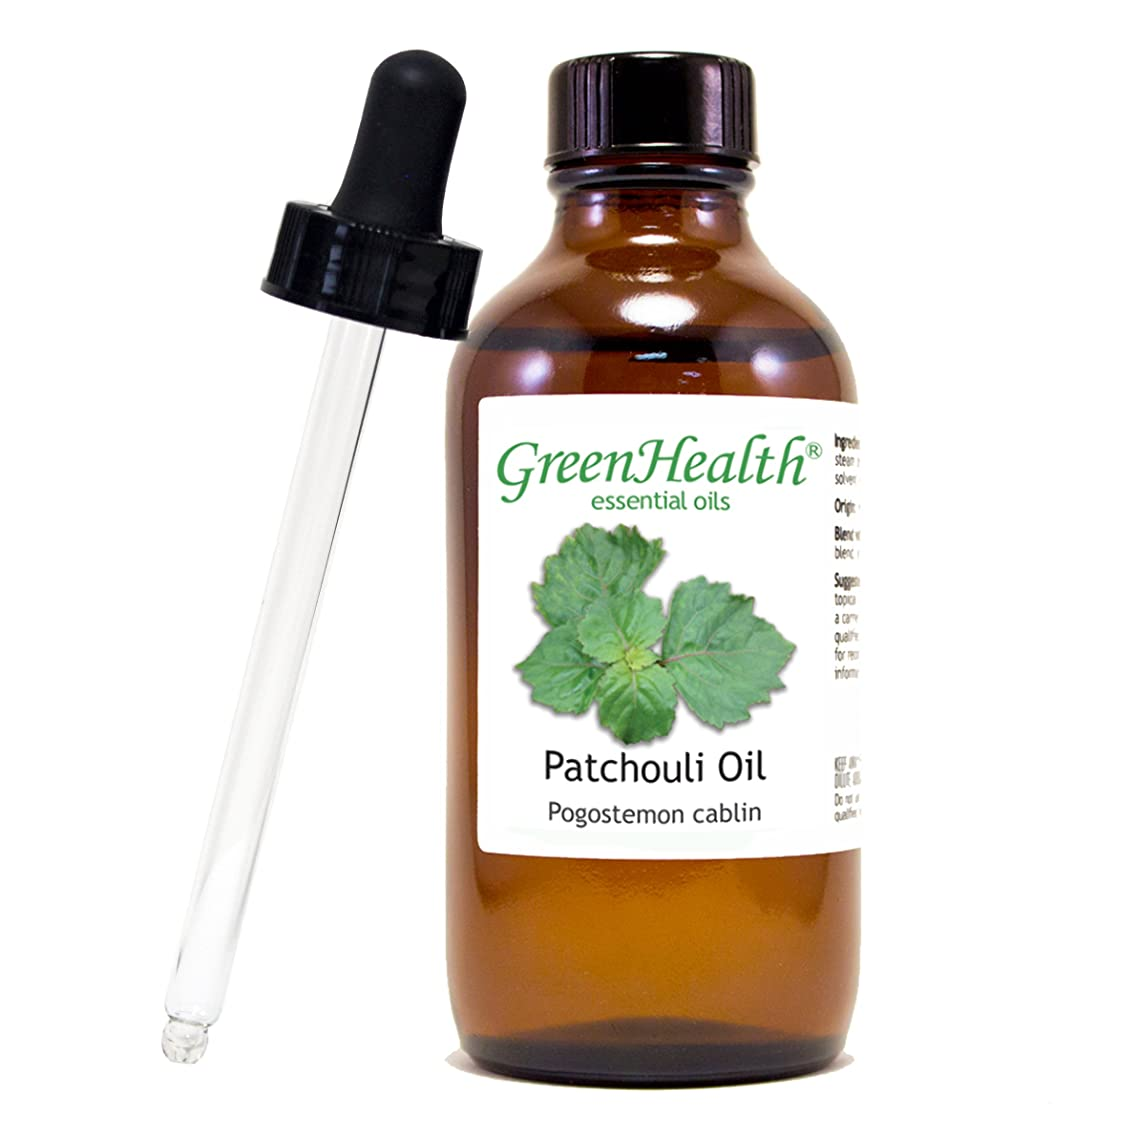 GreenHealth Patchouli – 4 fl oz (118 ml) Glass Bottle w/Glass Dropper – 100% Pure Essential Oil